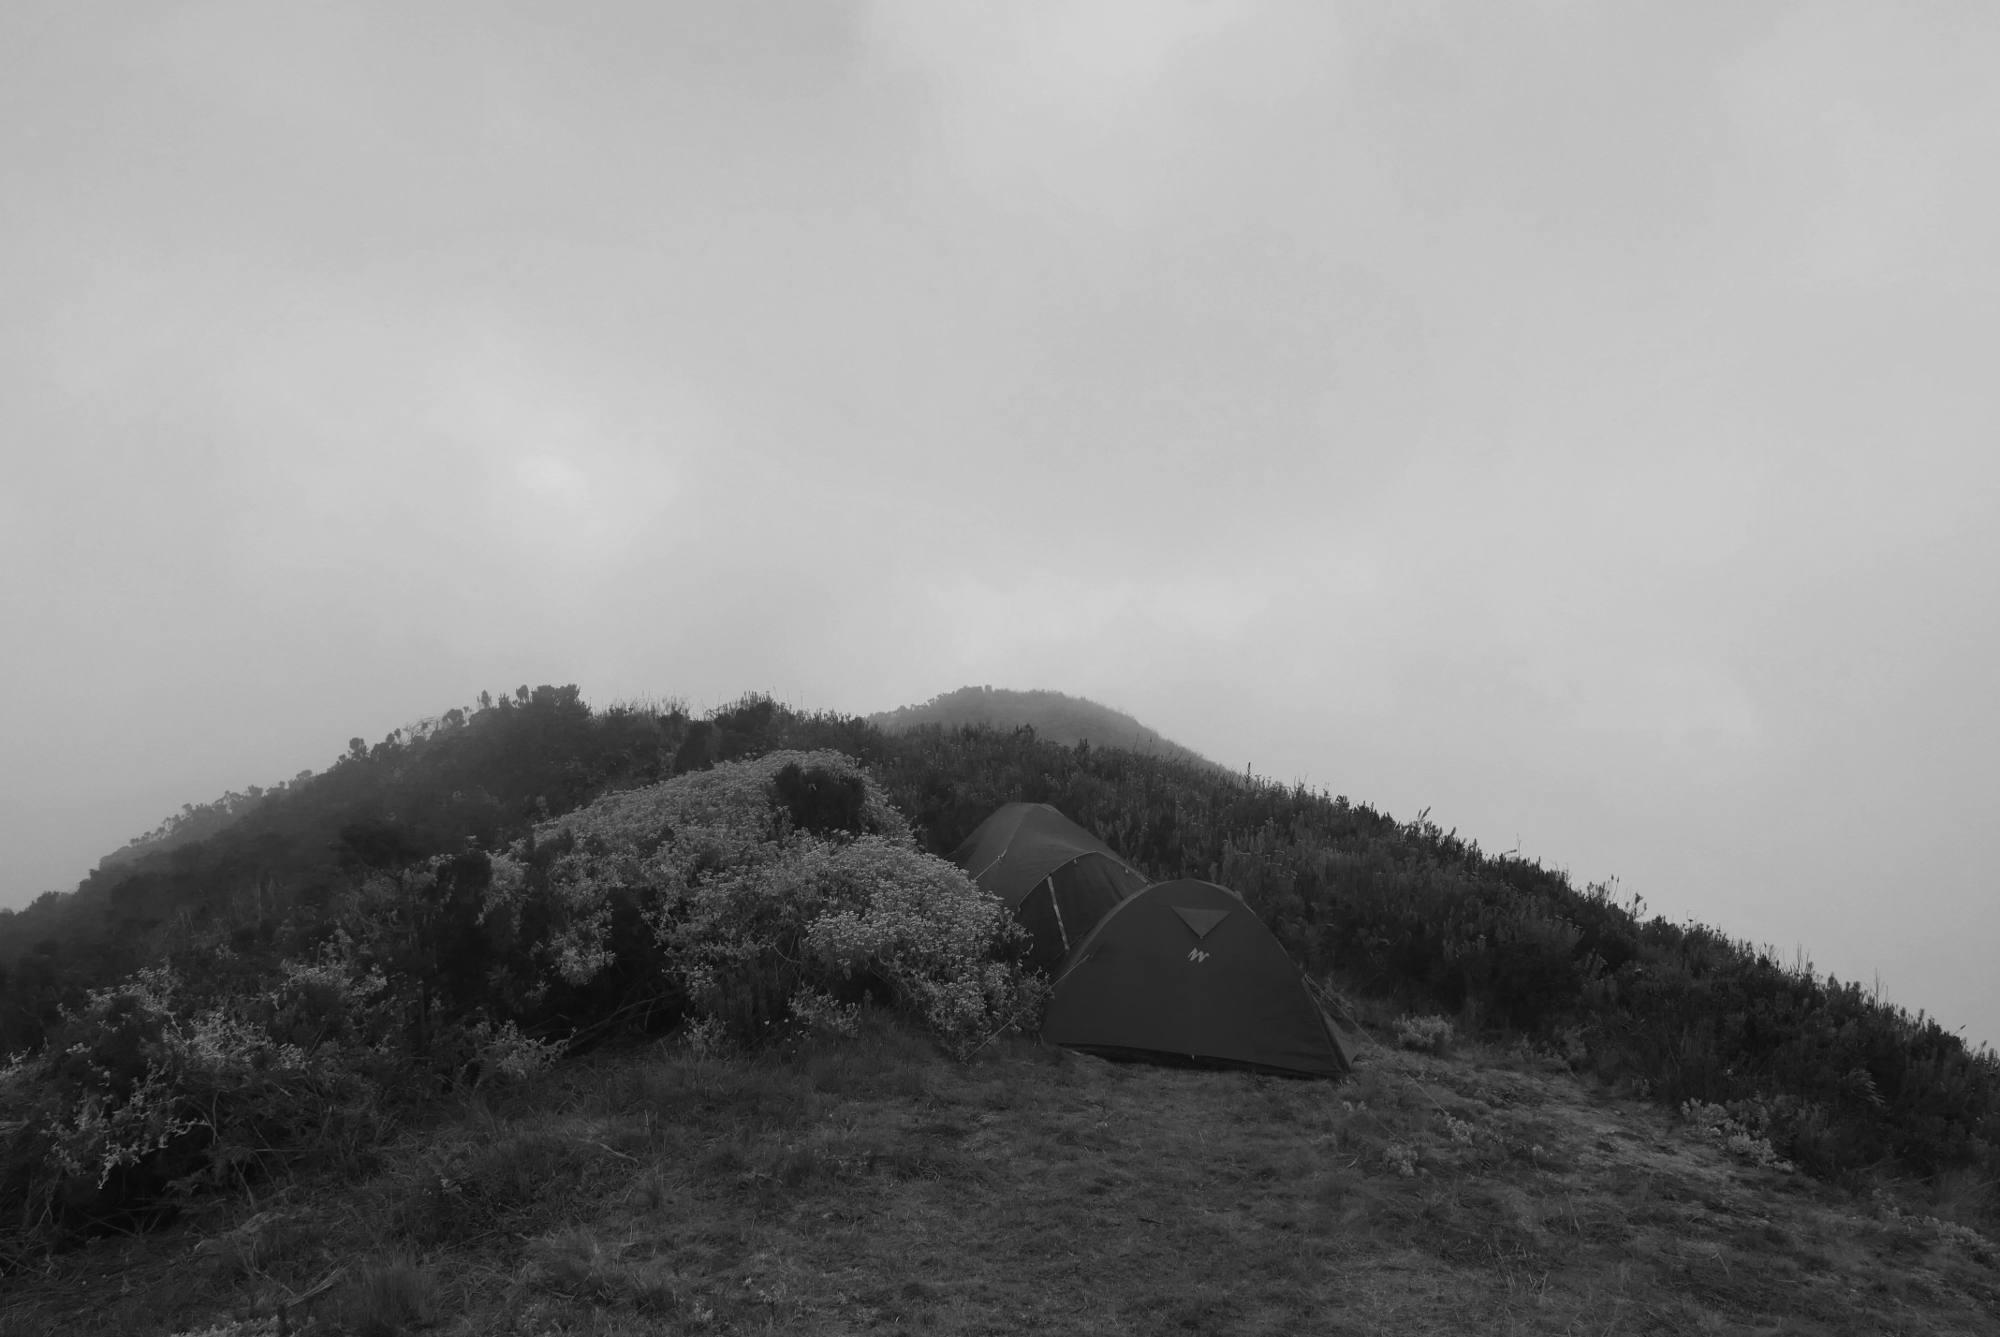 Mt. Hanang camp